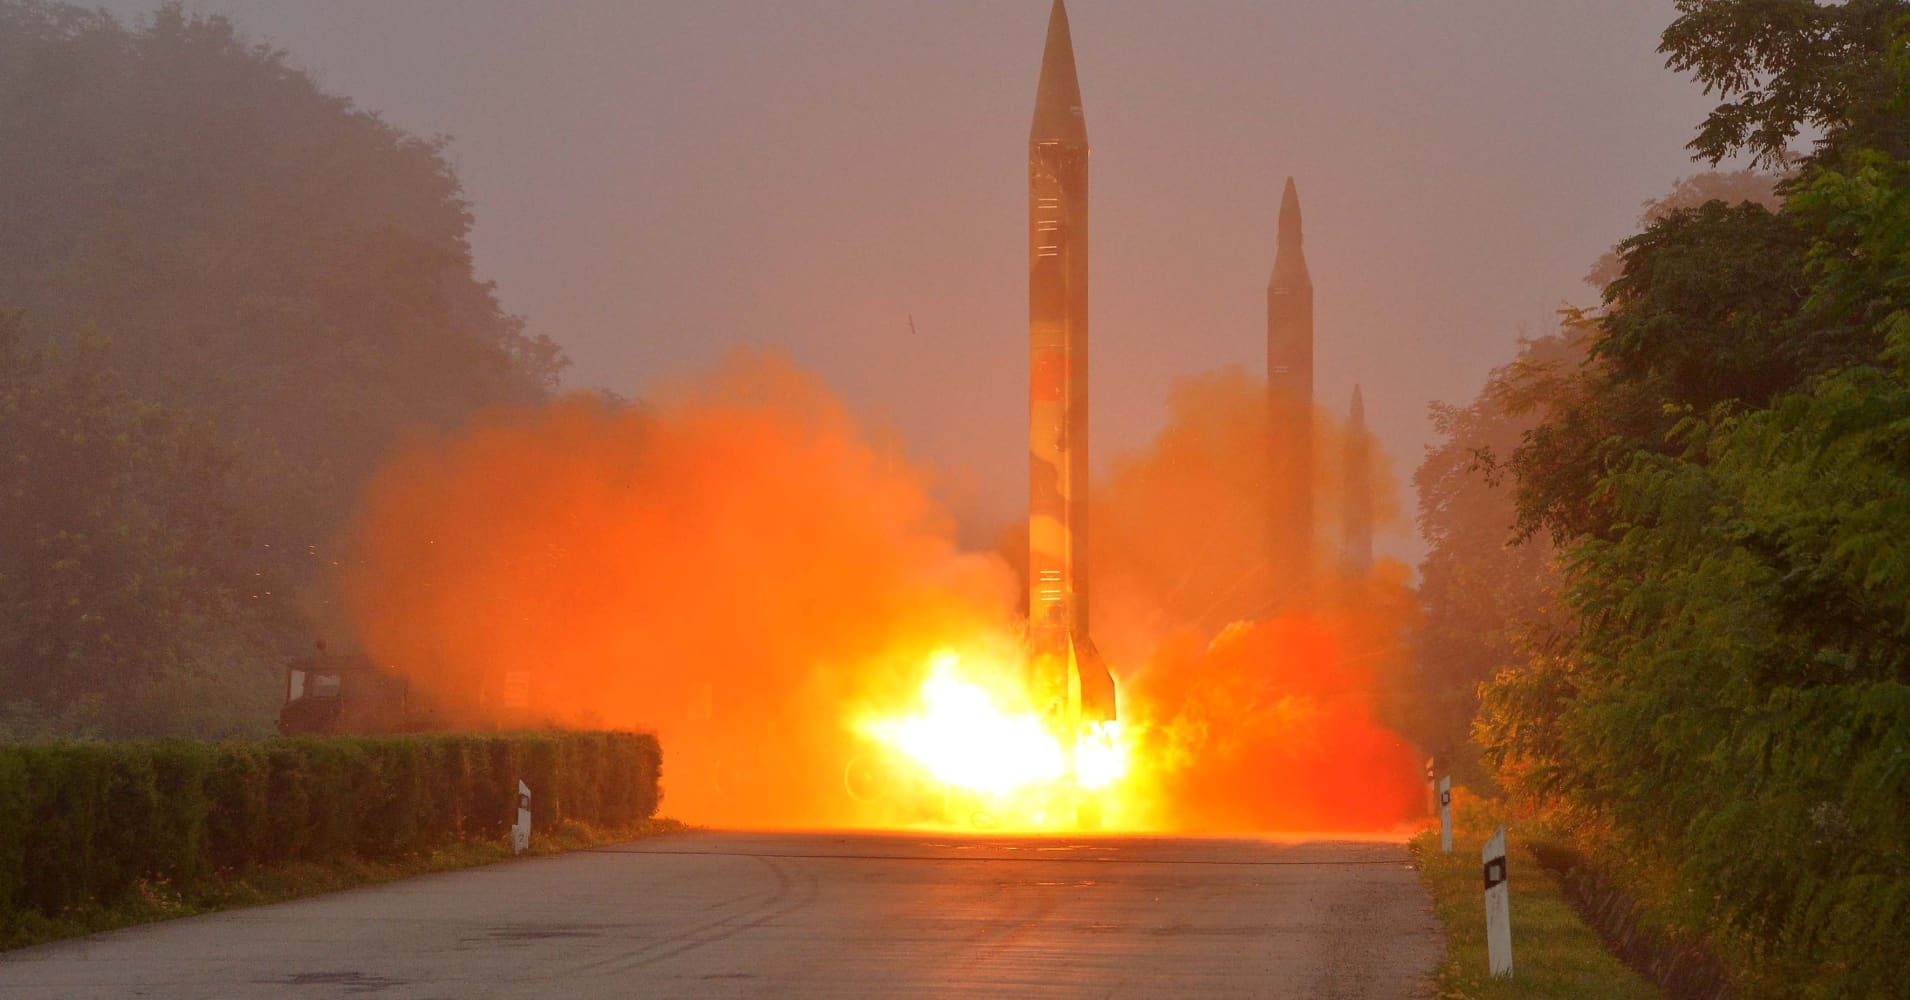 North Korea test-fires ballistic missile: Report